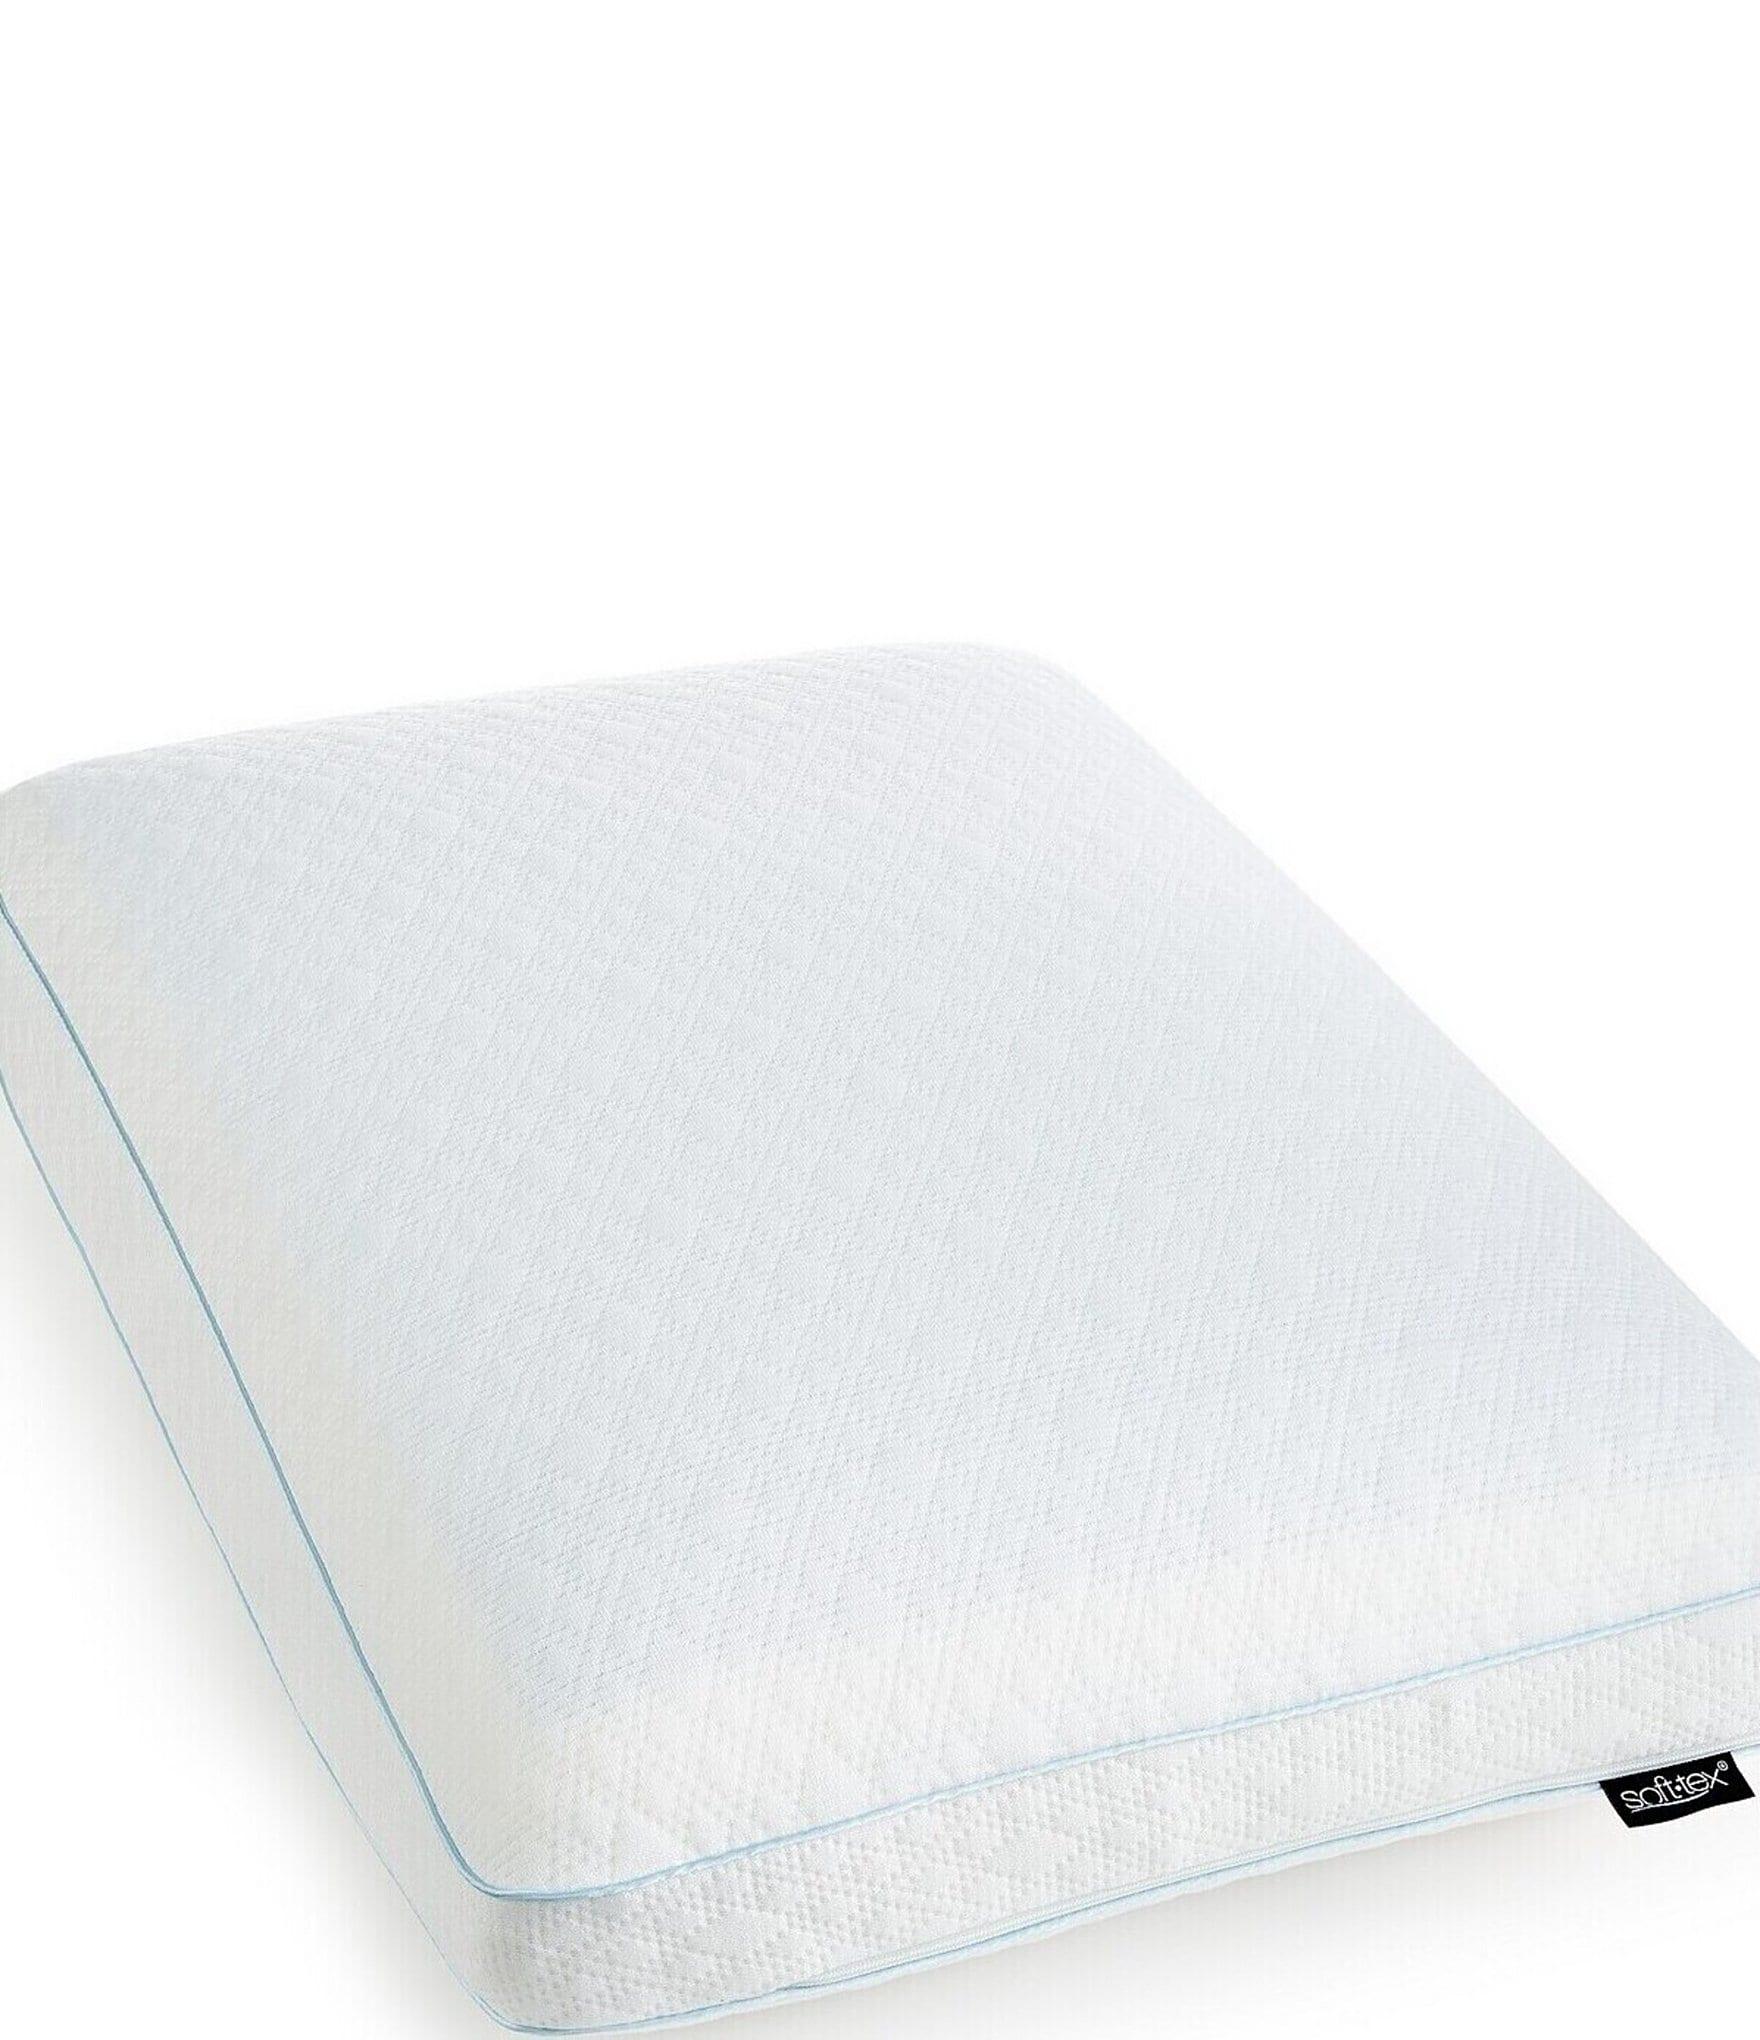 sensorpedic luxury cooling gel overlay memory foam bed pillow dillard s